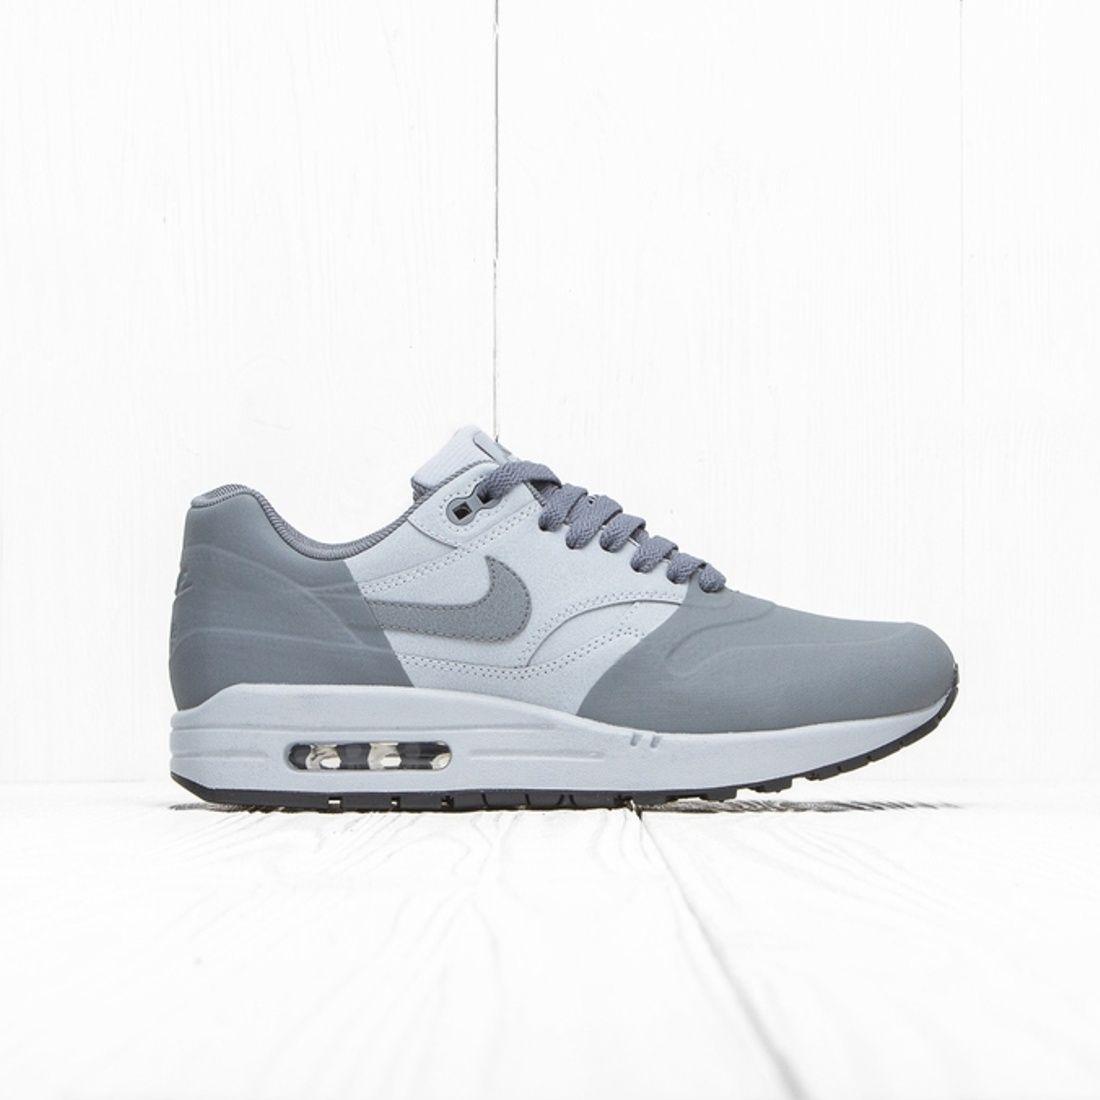 858876-001, Mens Sneakers Nike